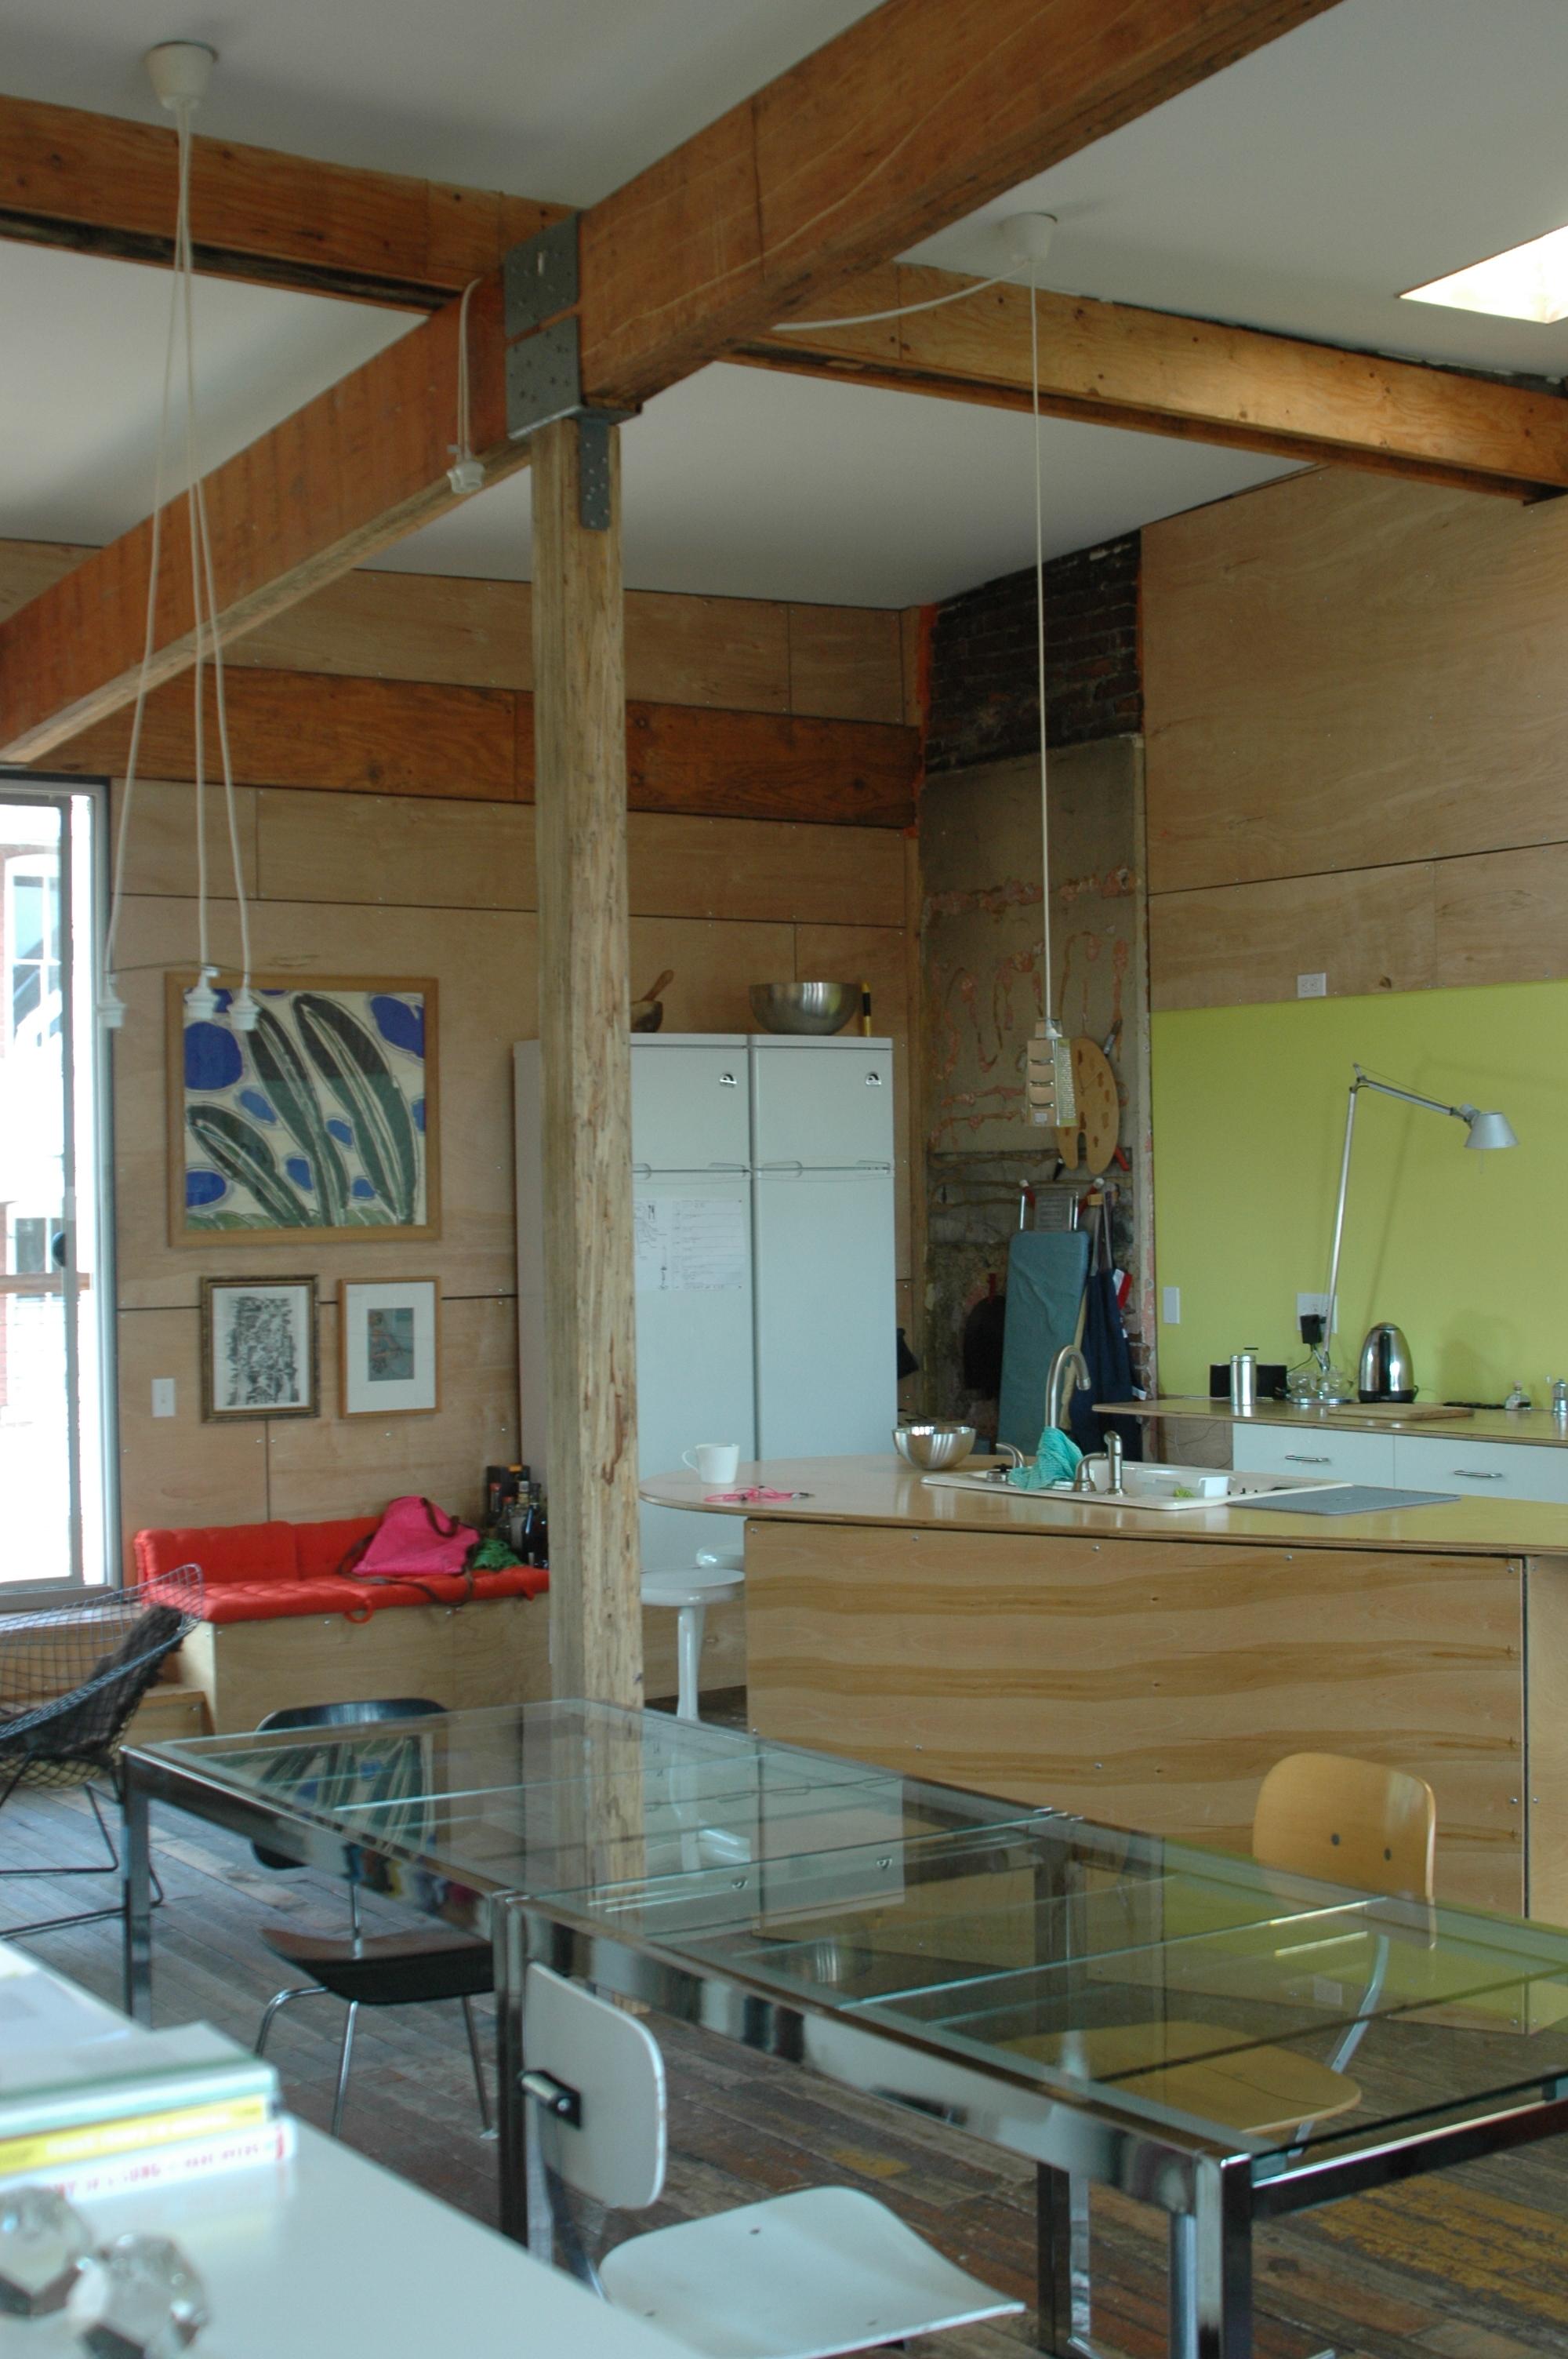 Interior, Arscott's home. Photo courtesy of KelliLaurel Mijares.